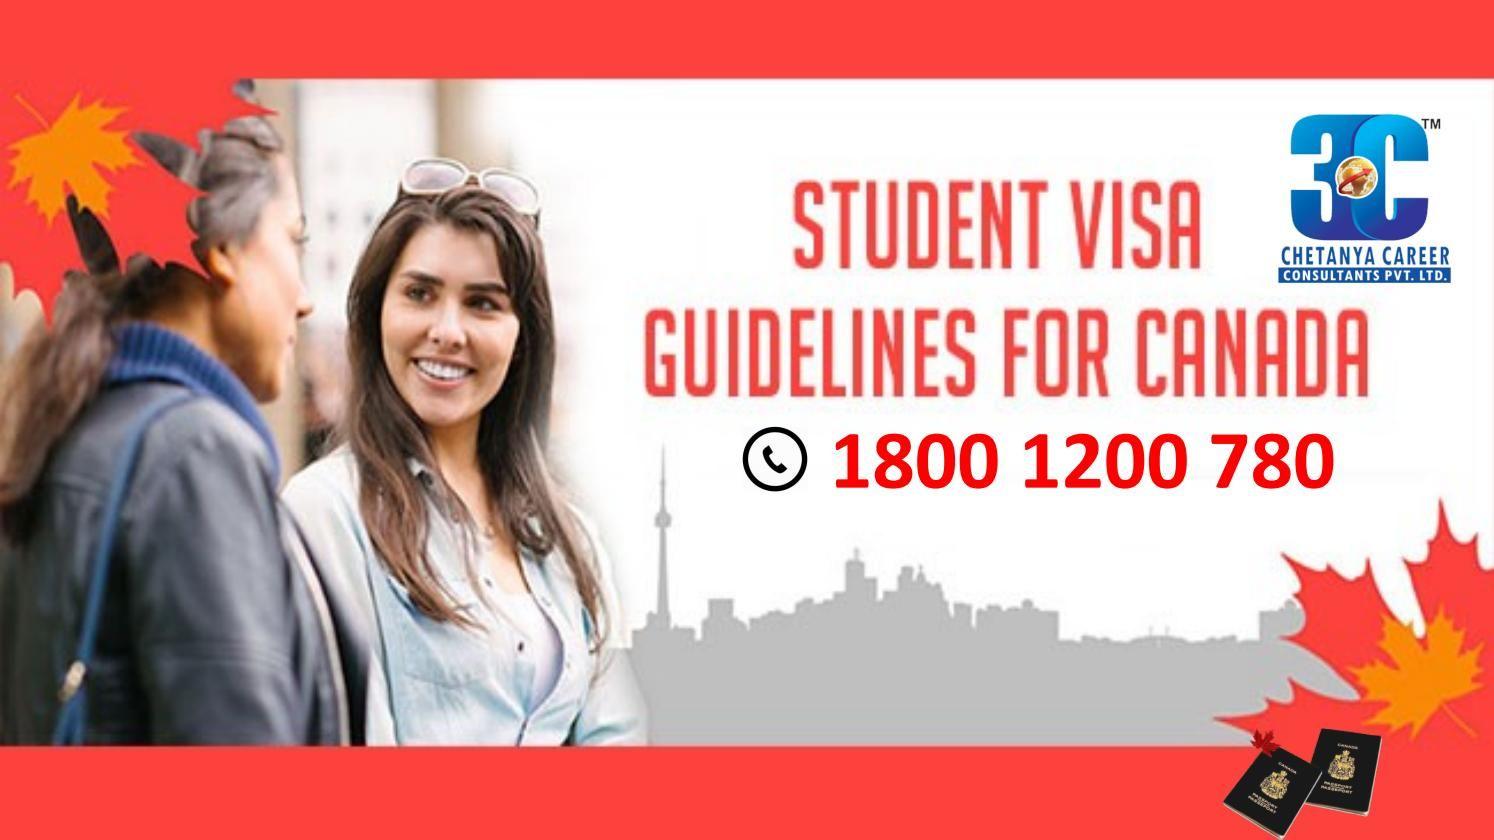 STUDENT VISA GUIDELINES FOR CANADA Student, Visa